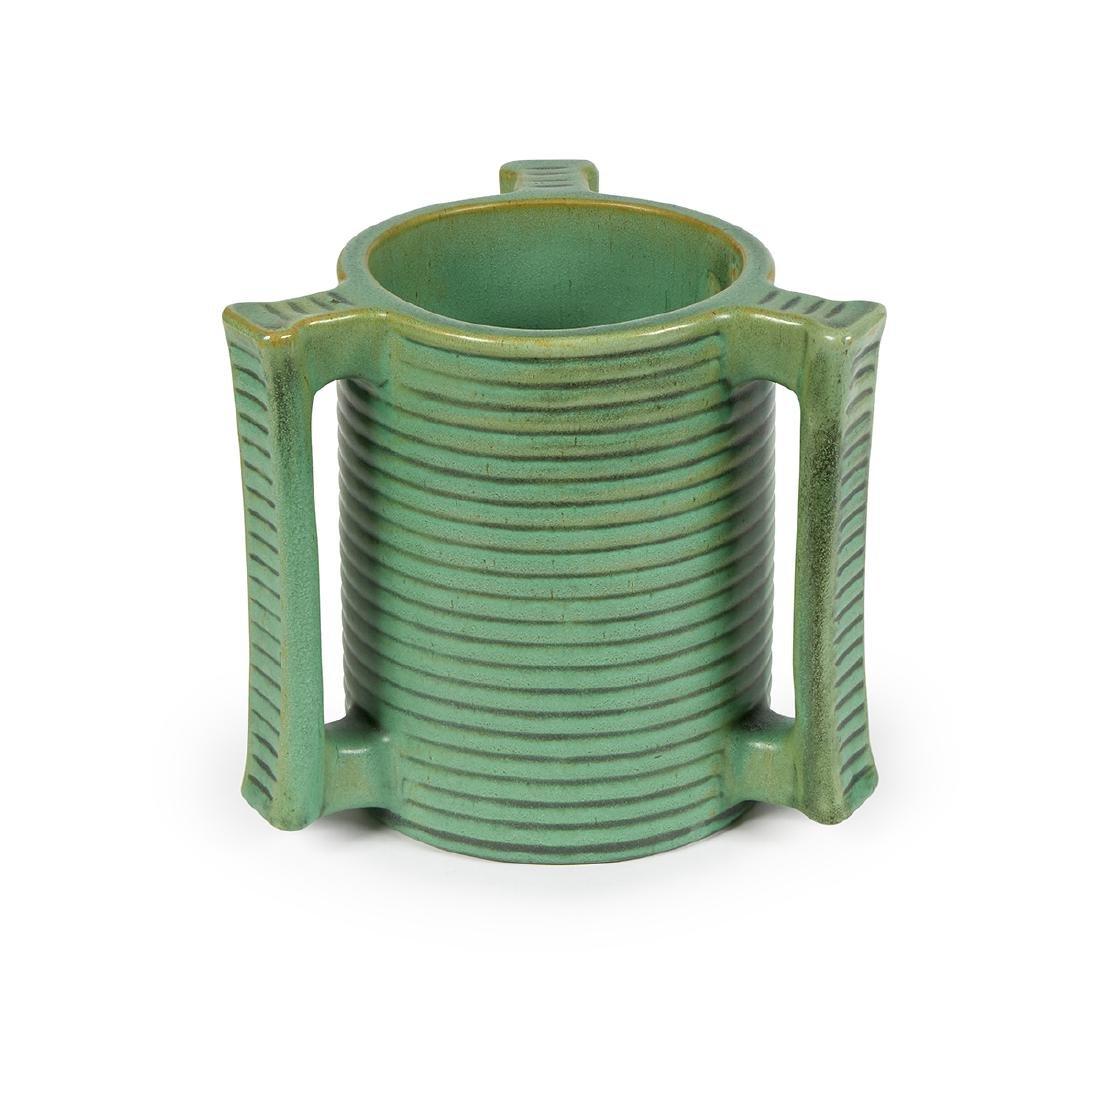 Teco, W.D. Gates, Three-Handled Vase, #278